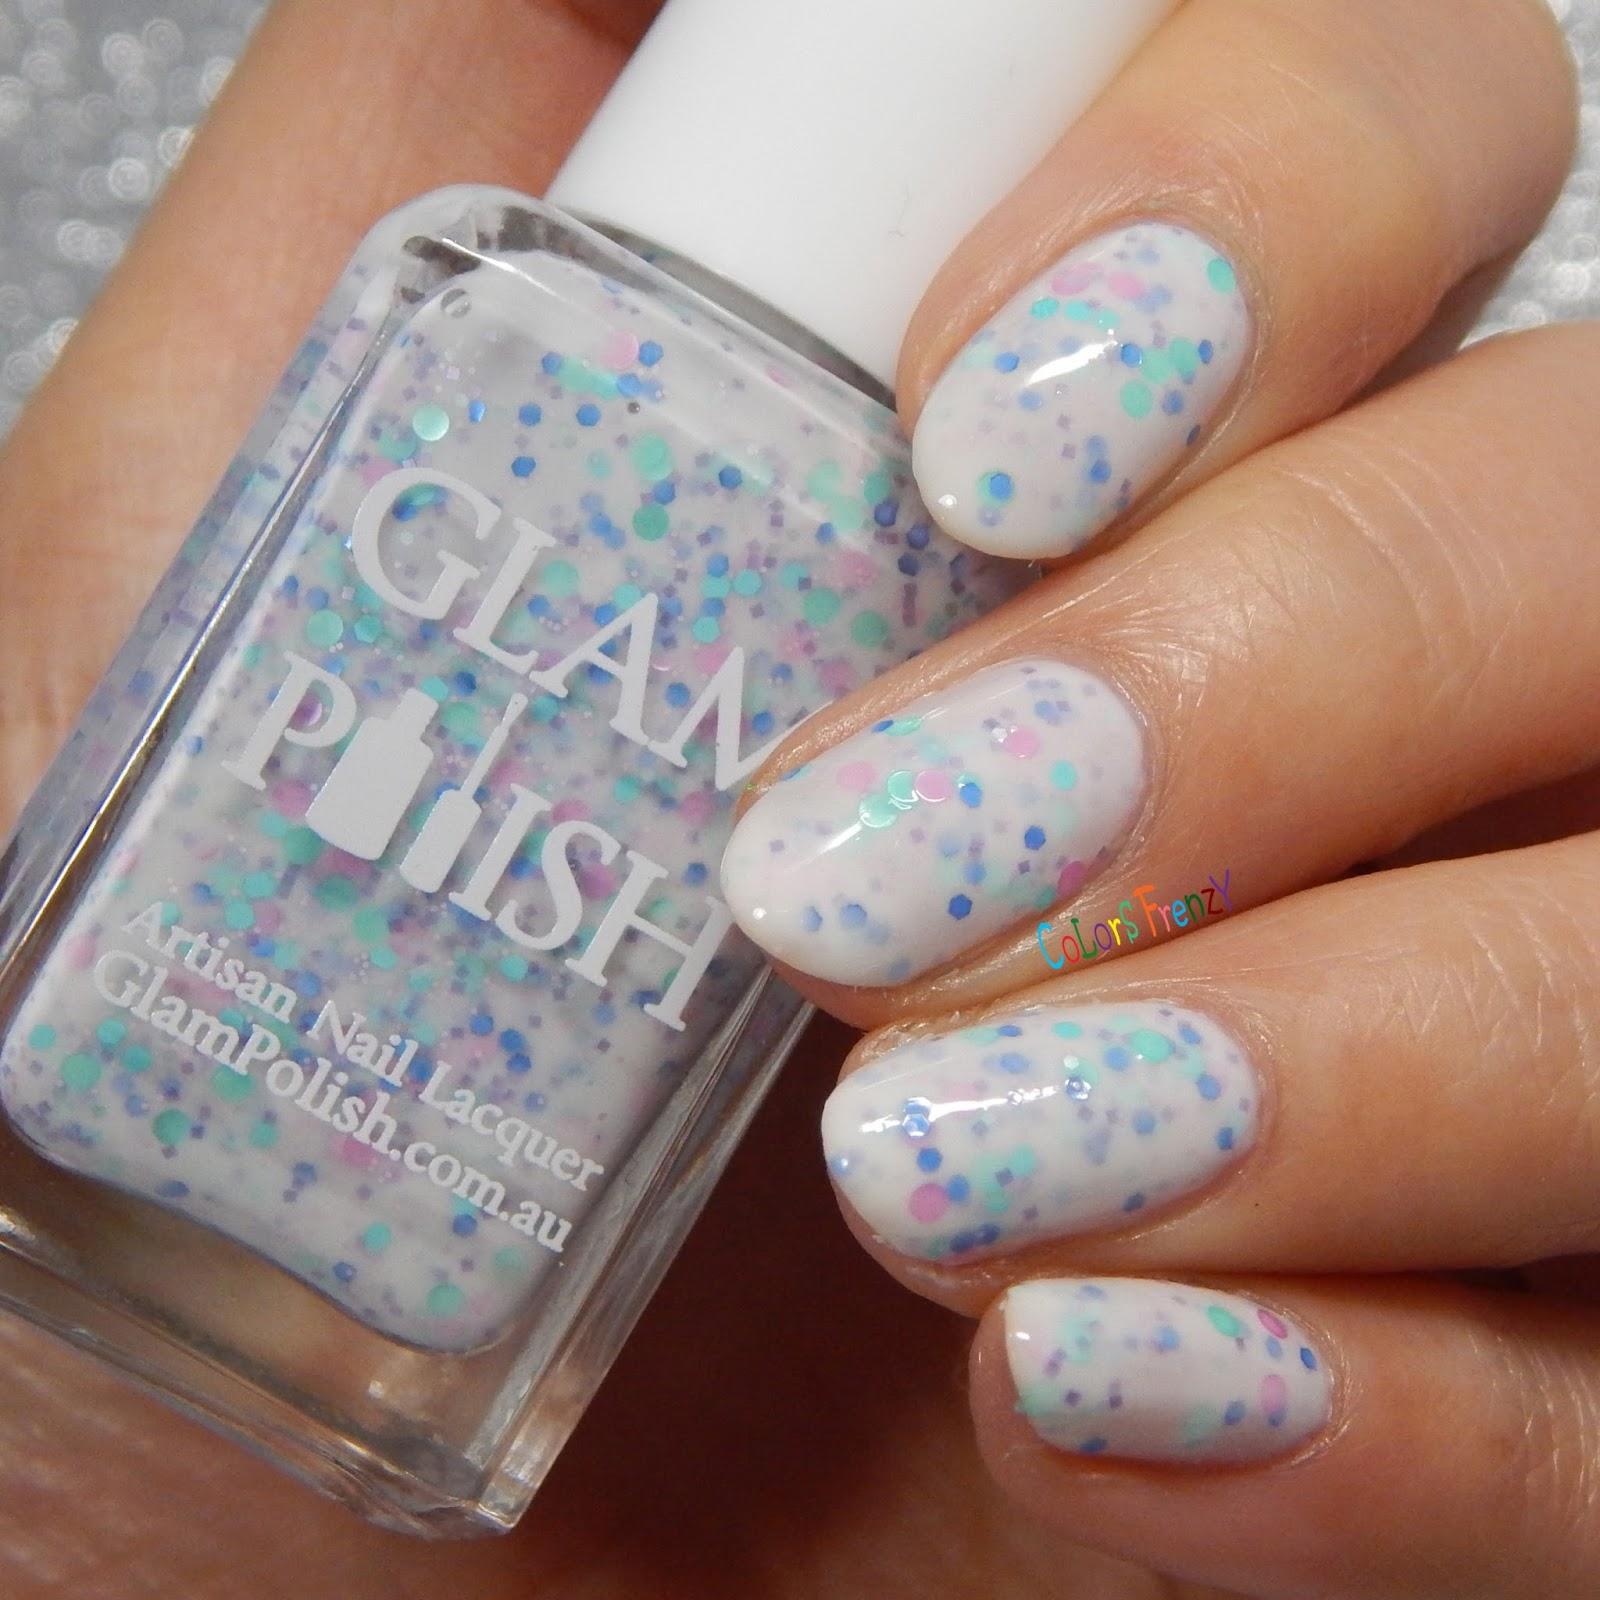 glam-polish-in-summer